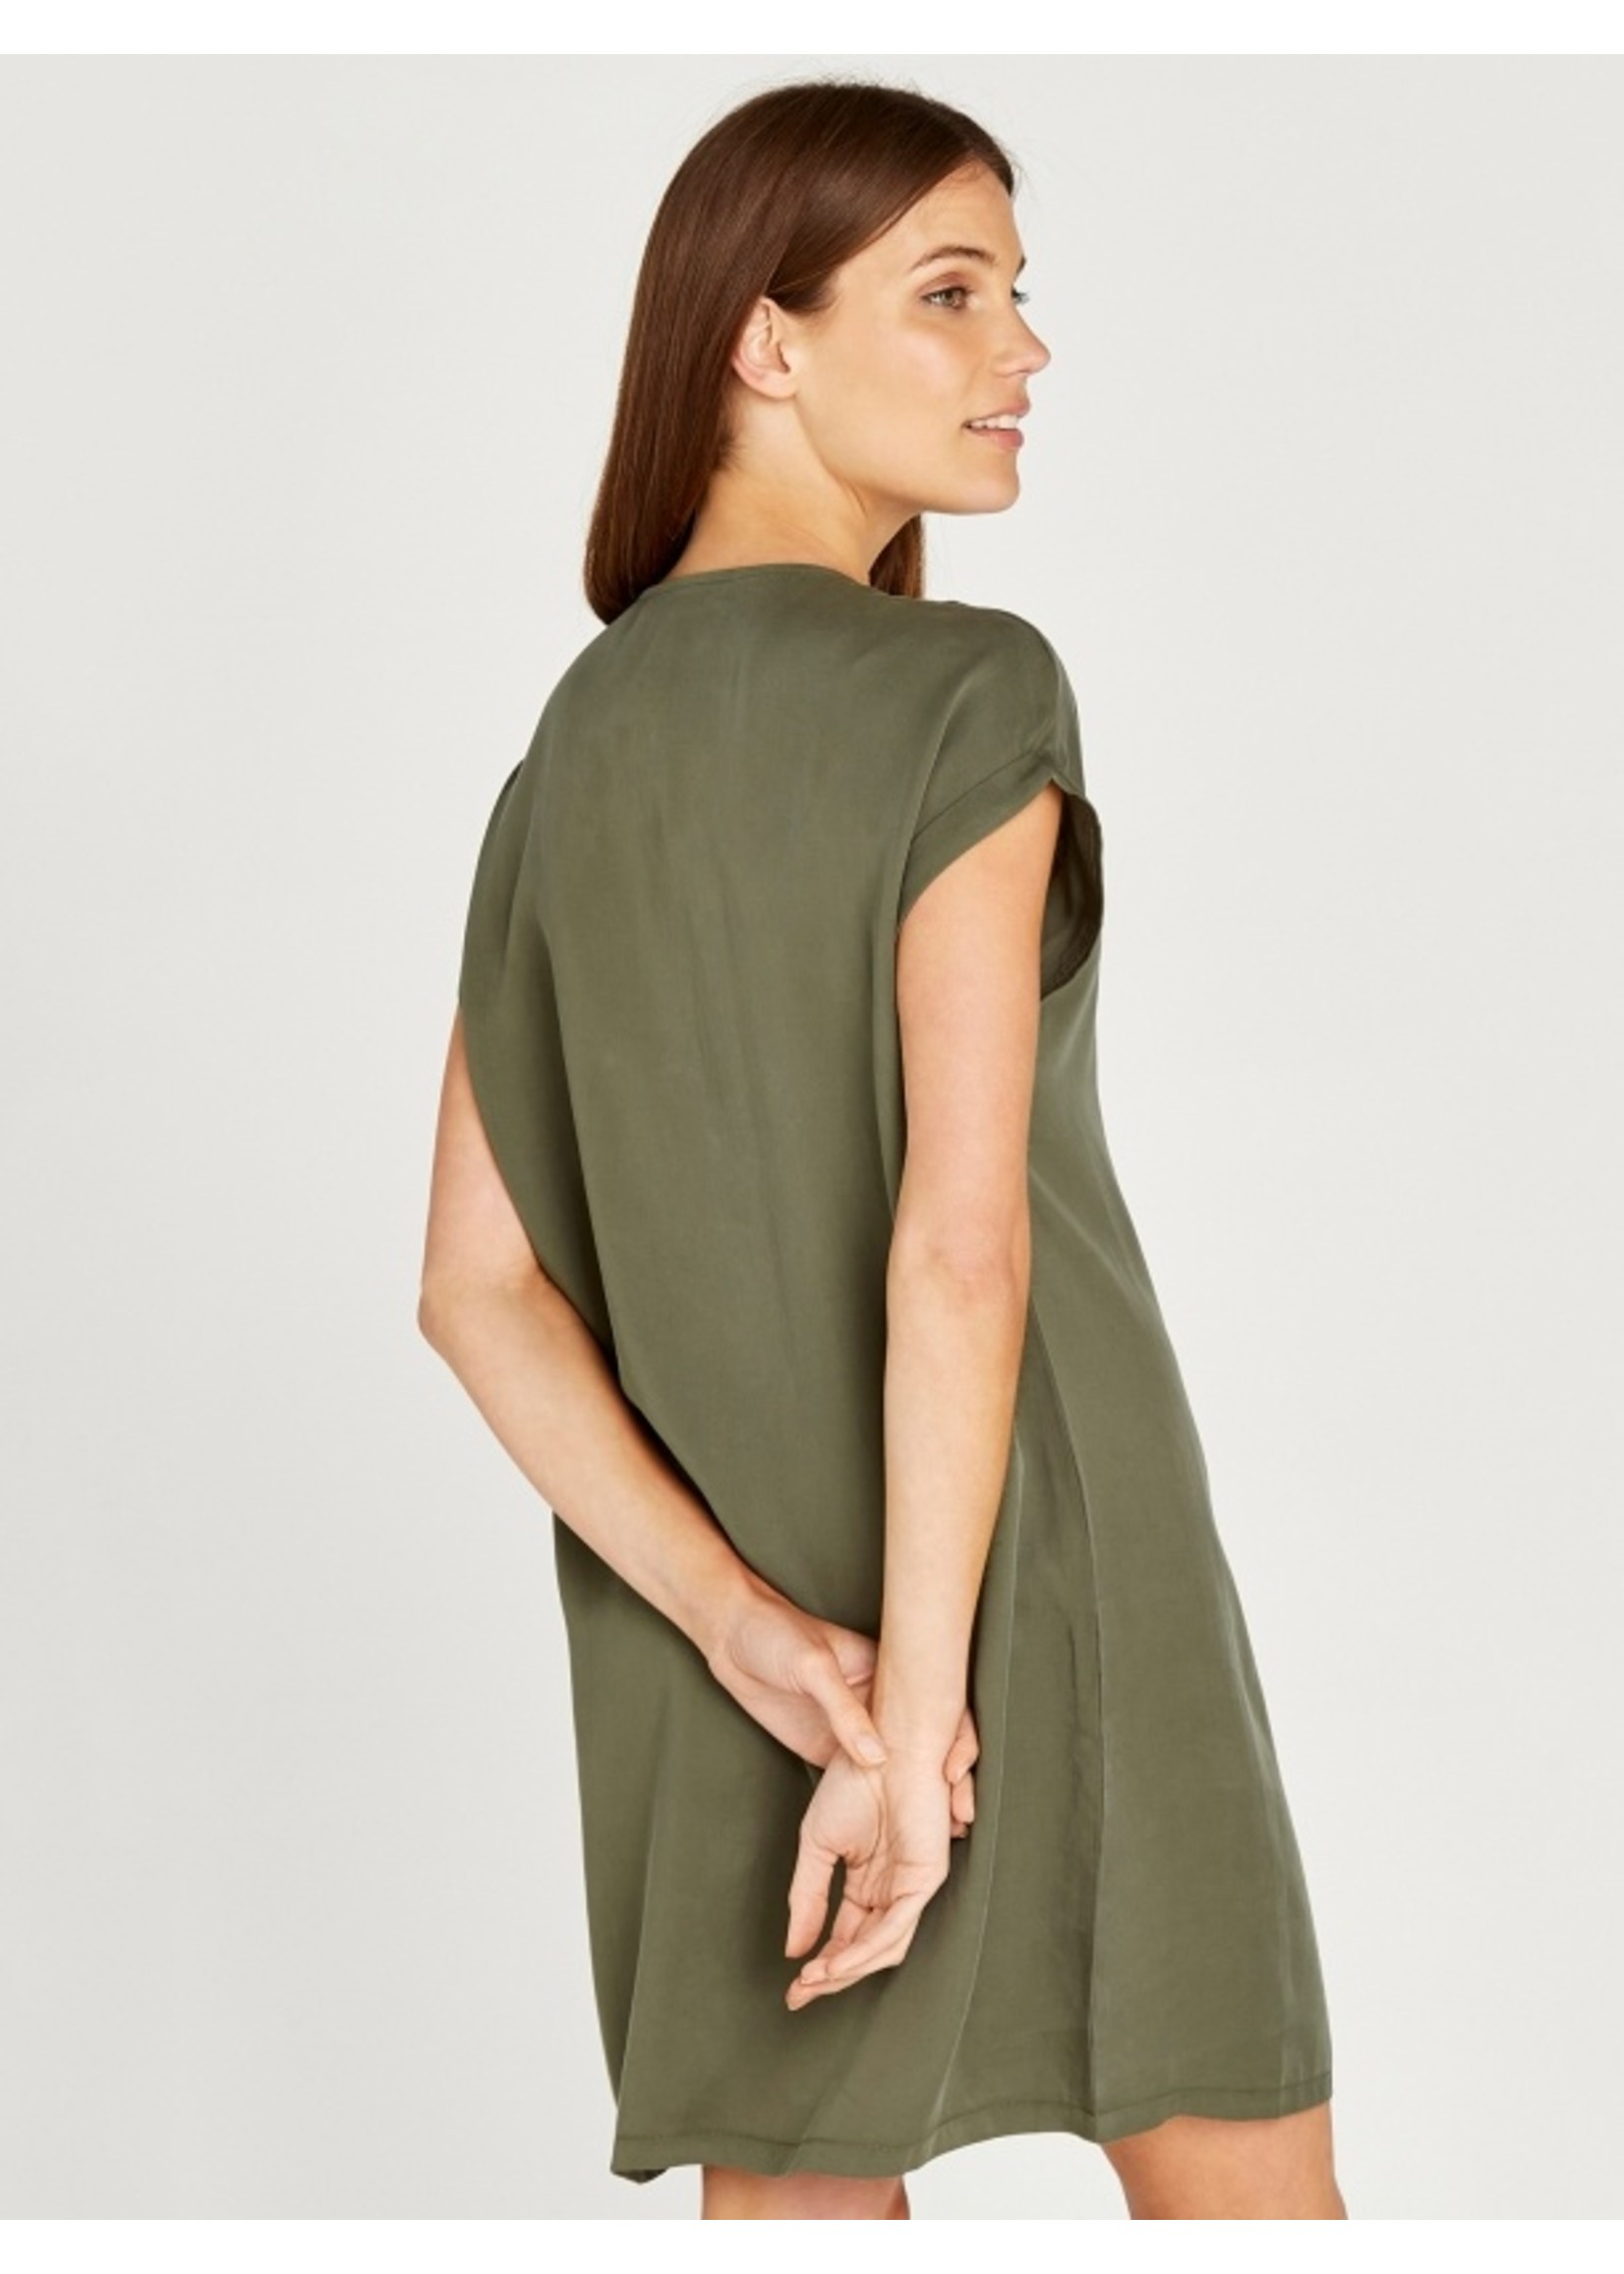 Apricot Tencel Zip Front Turn Up Dress